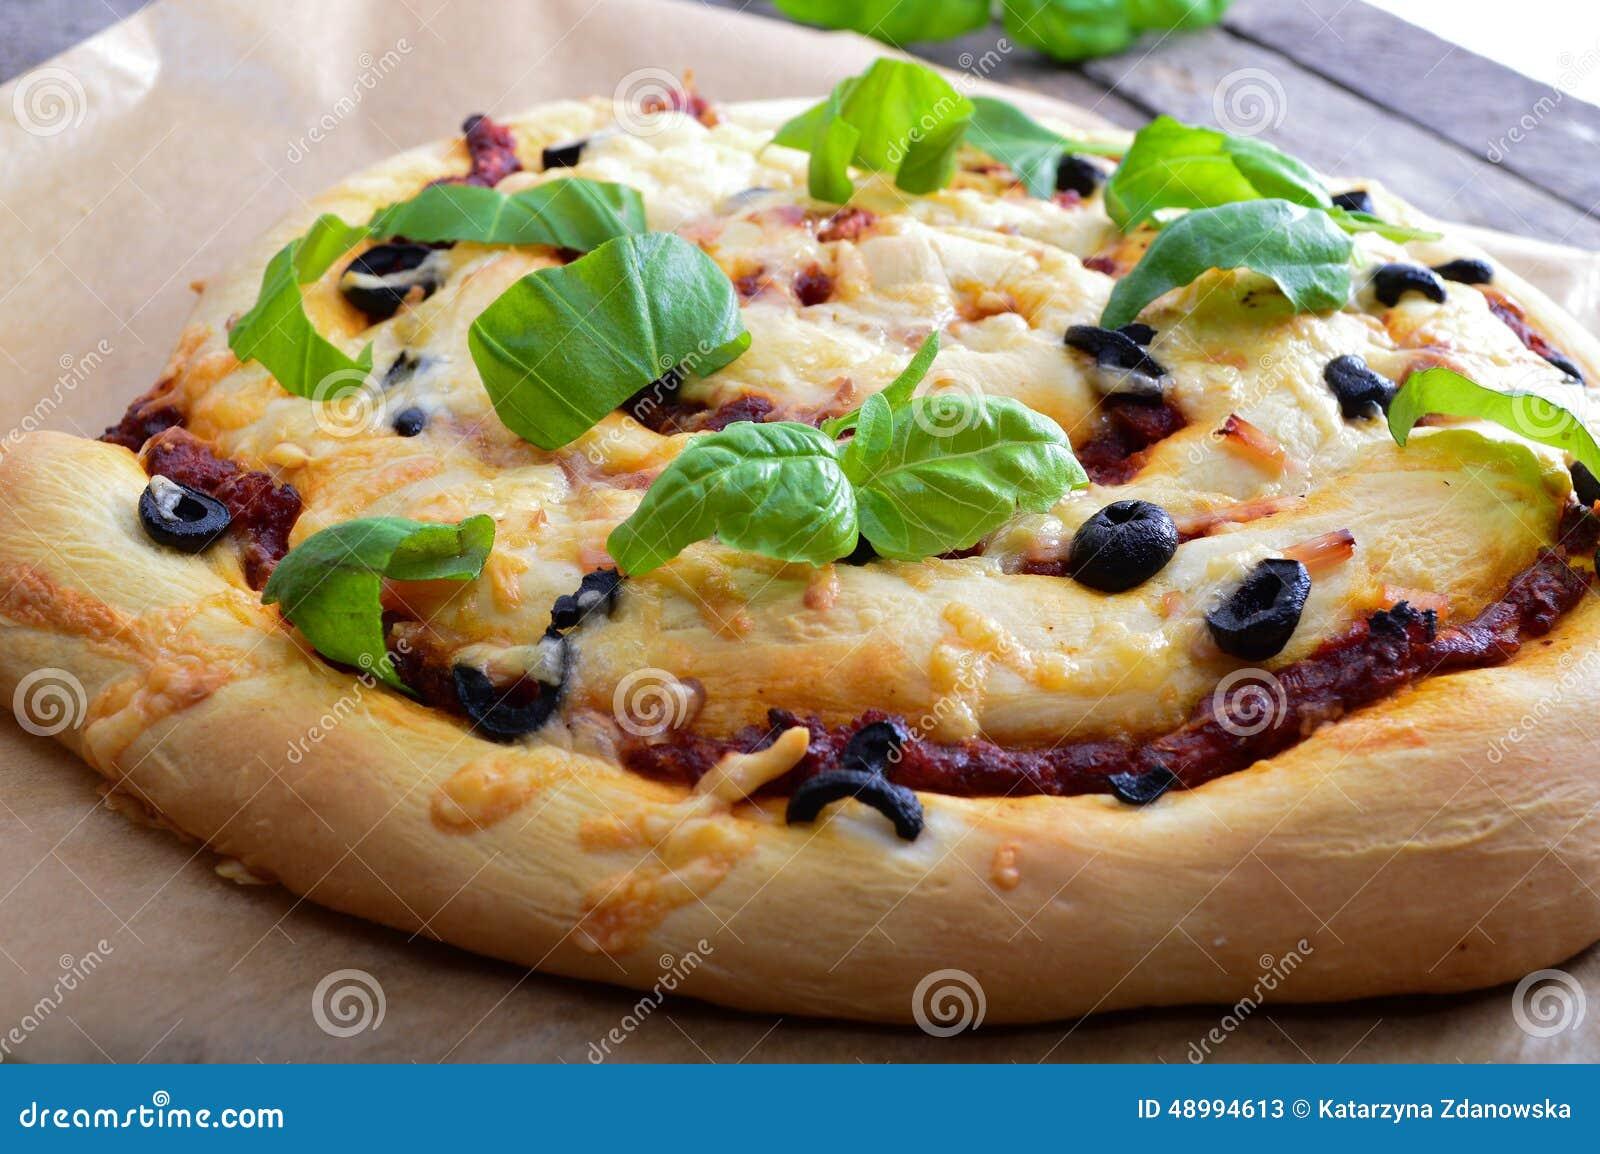 pizza mit tomatensauce und basilikum gesund di tpizza stockfoto bild 48994613. Black Bedroom Furniture Sets. Home Design Ideas